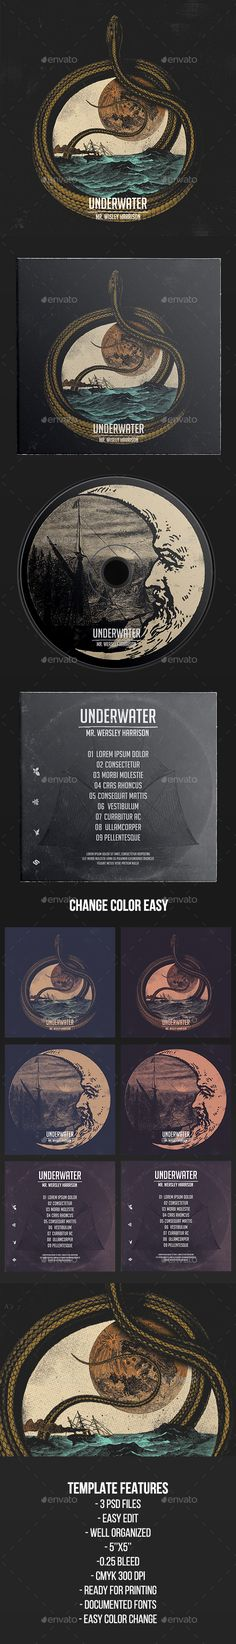 Underwater - CD Cover Artwork Template - CD & DVD Artwork Print Templates